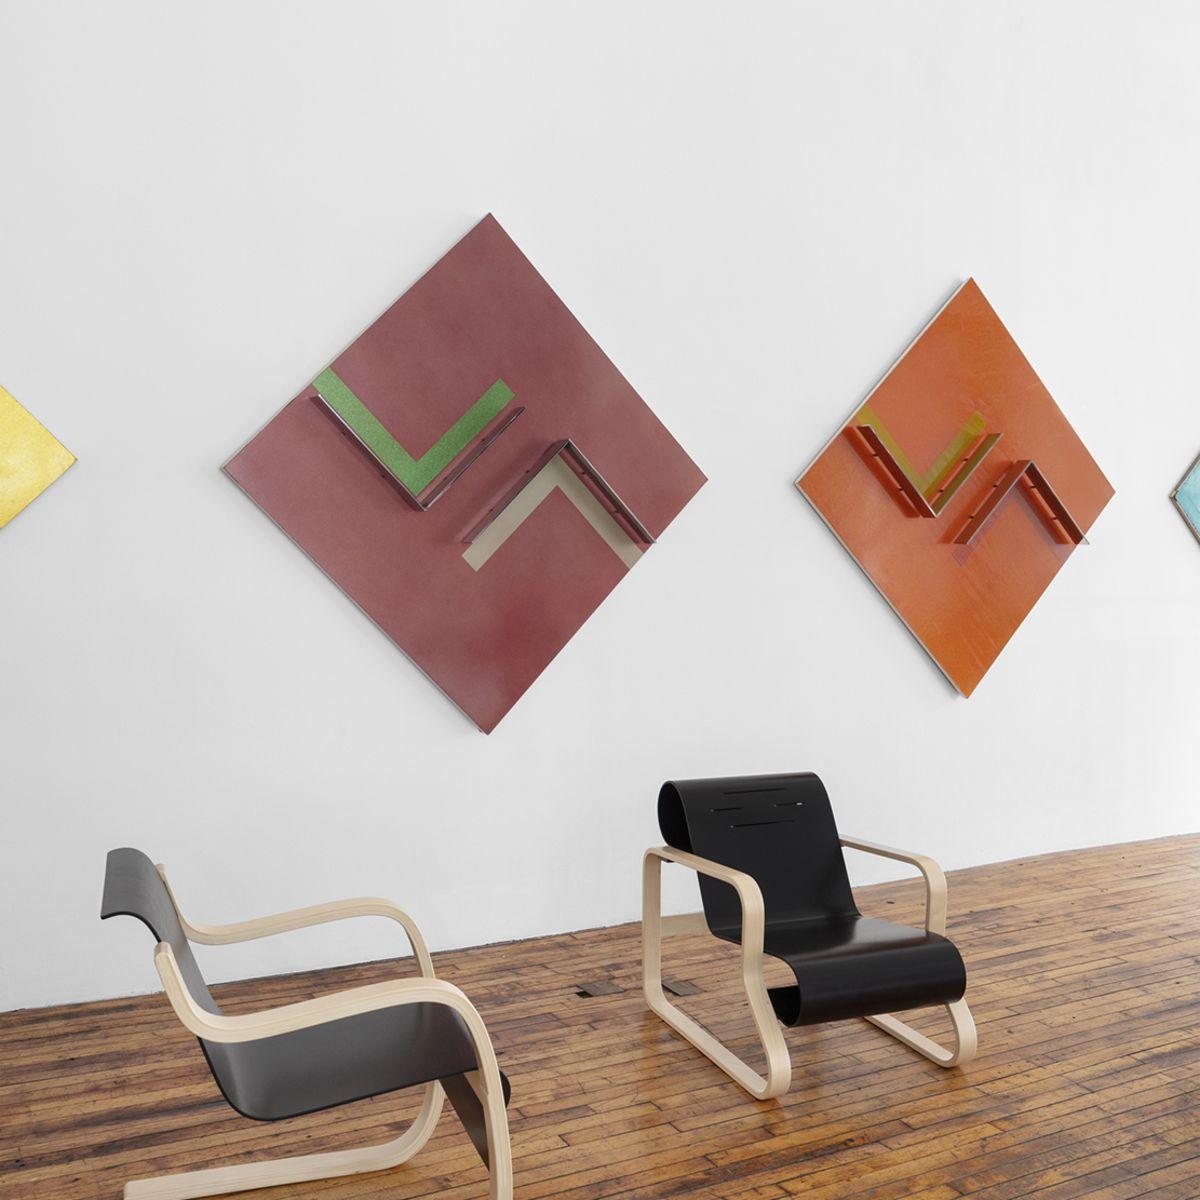 Aalto-Chamberlain-Installation-3-photo-Timothy-Doyon-copyright-Judd-Foundation